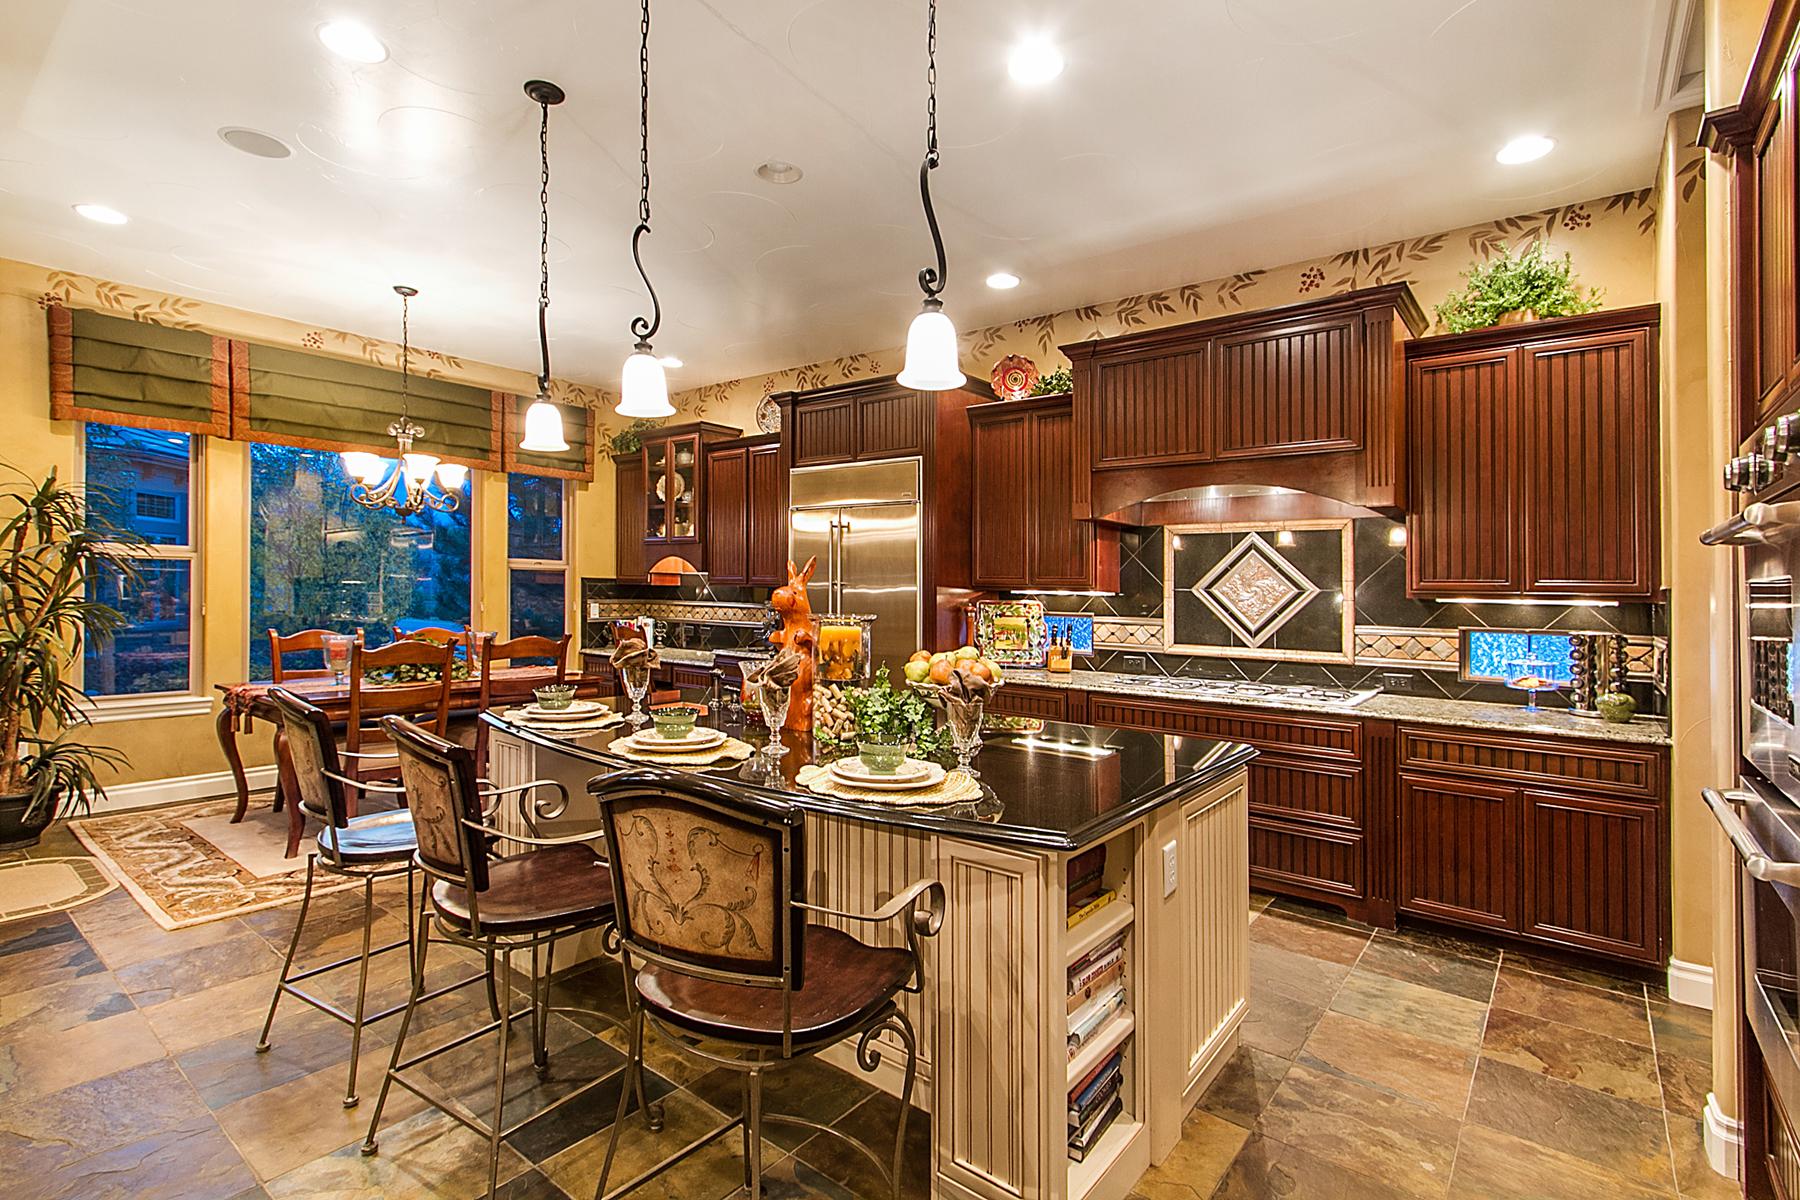 House Kitchen Interior Design Pictures